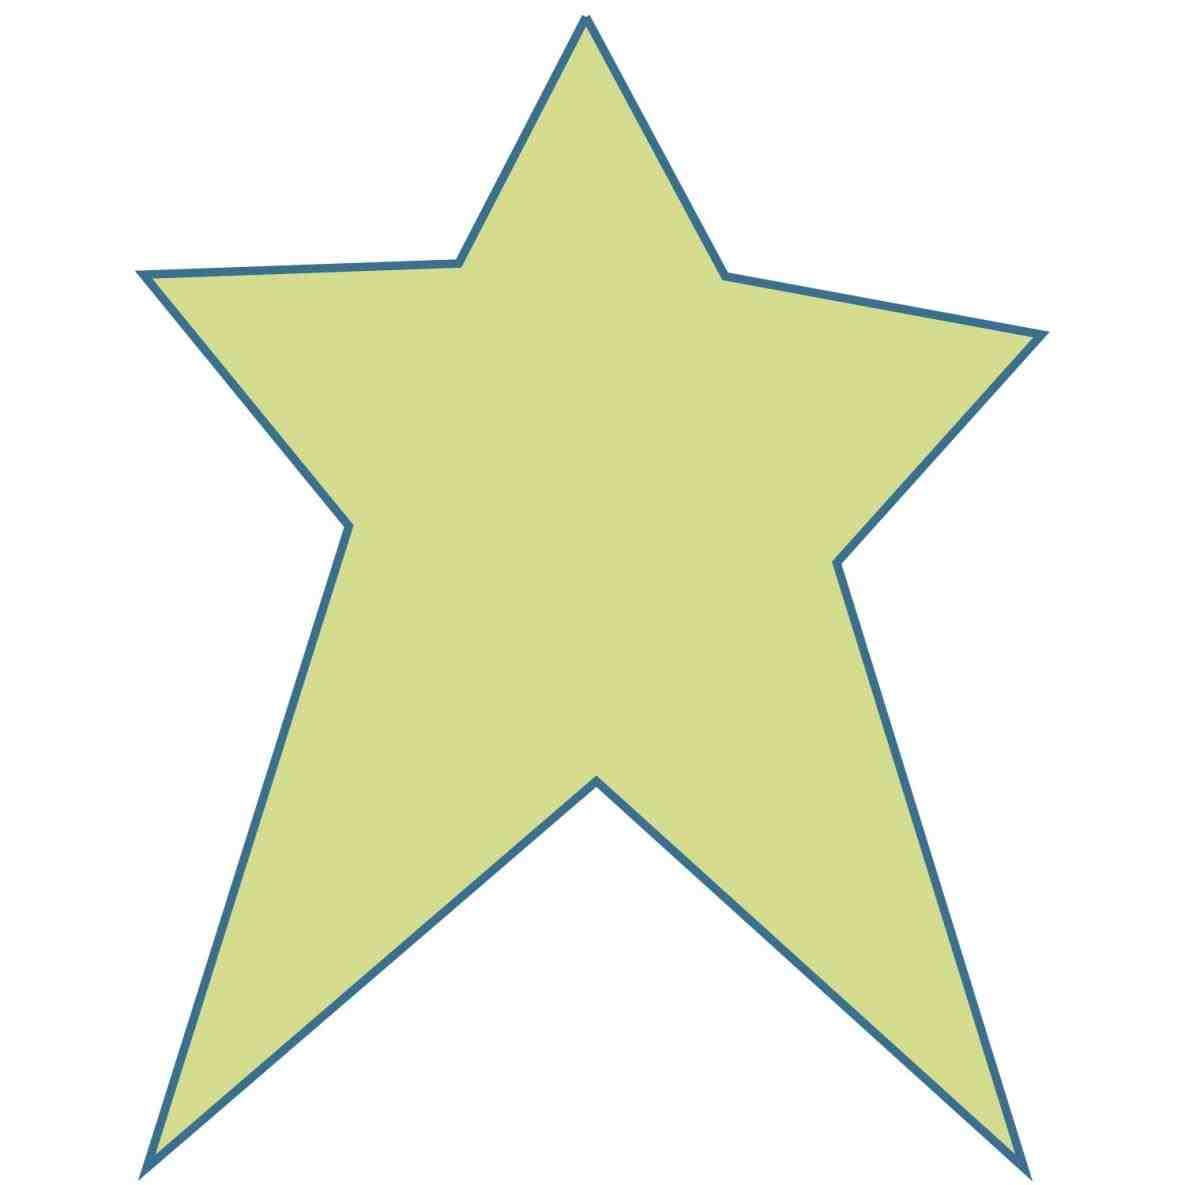 1185x1185 Christmas Star Outline Cheminee.website